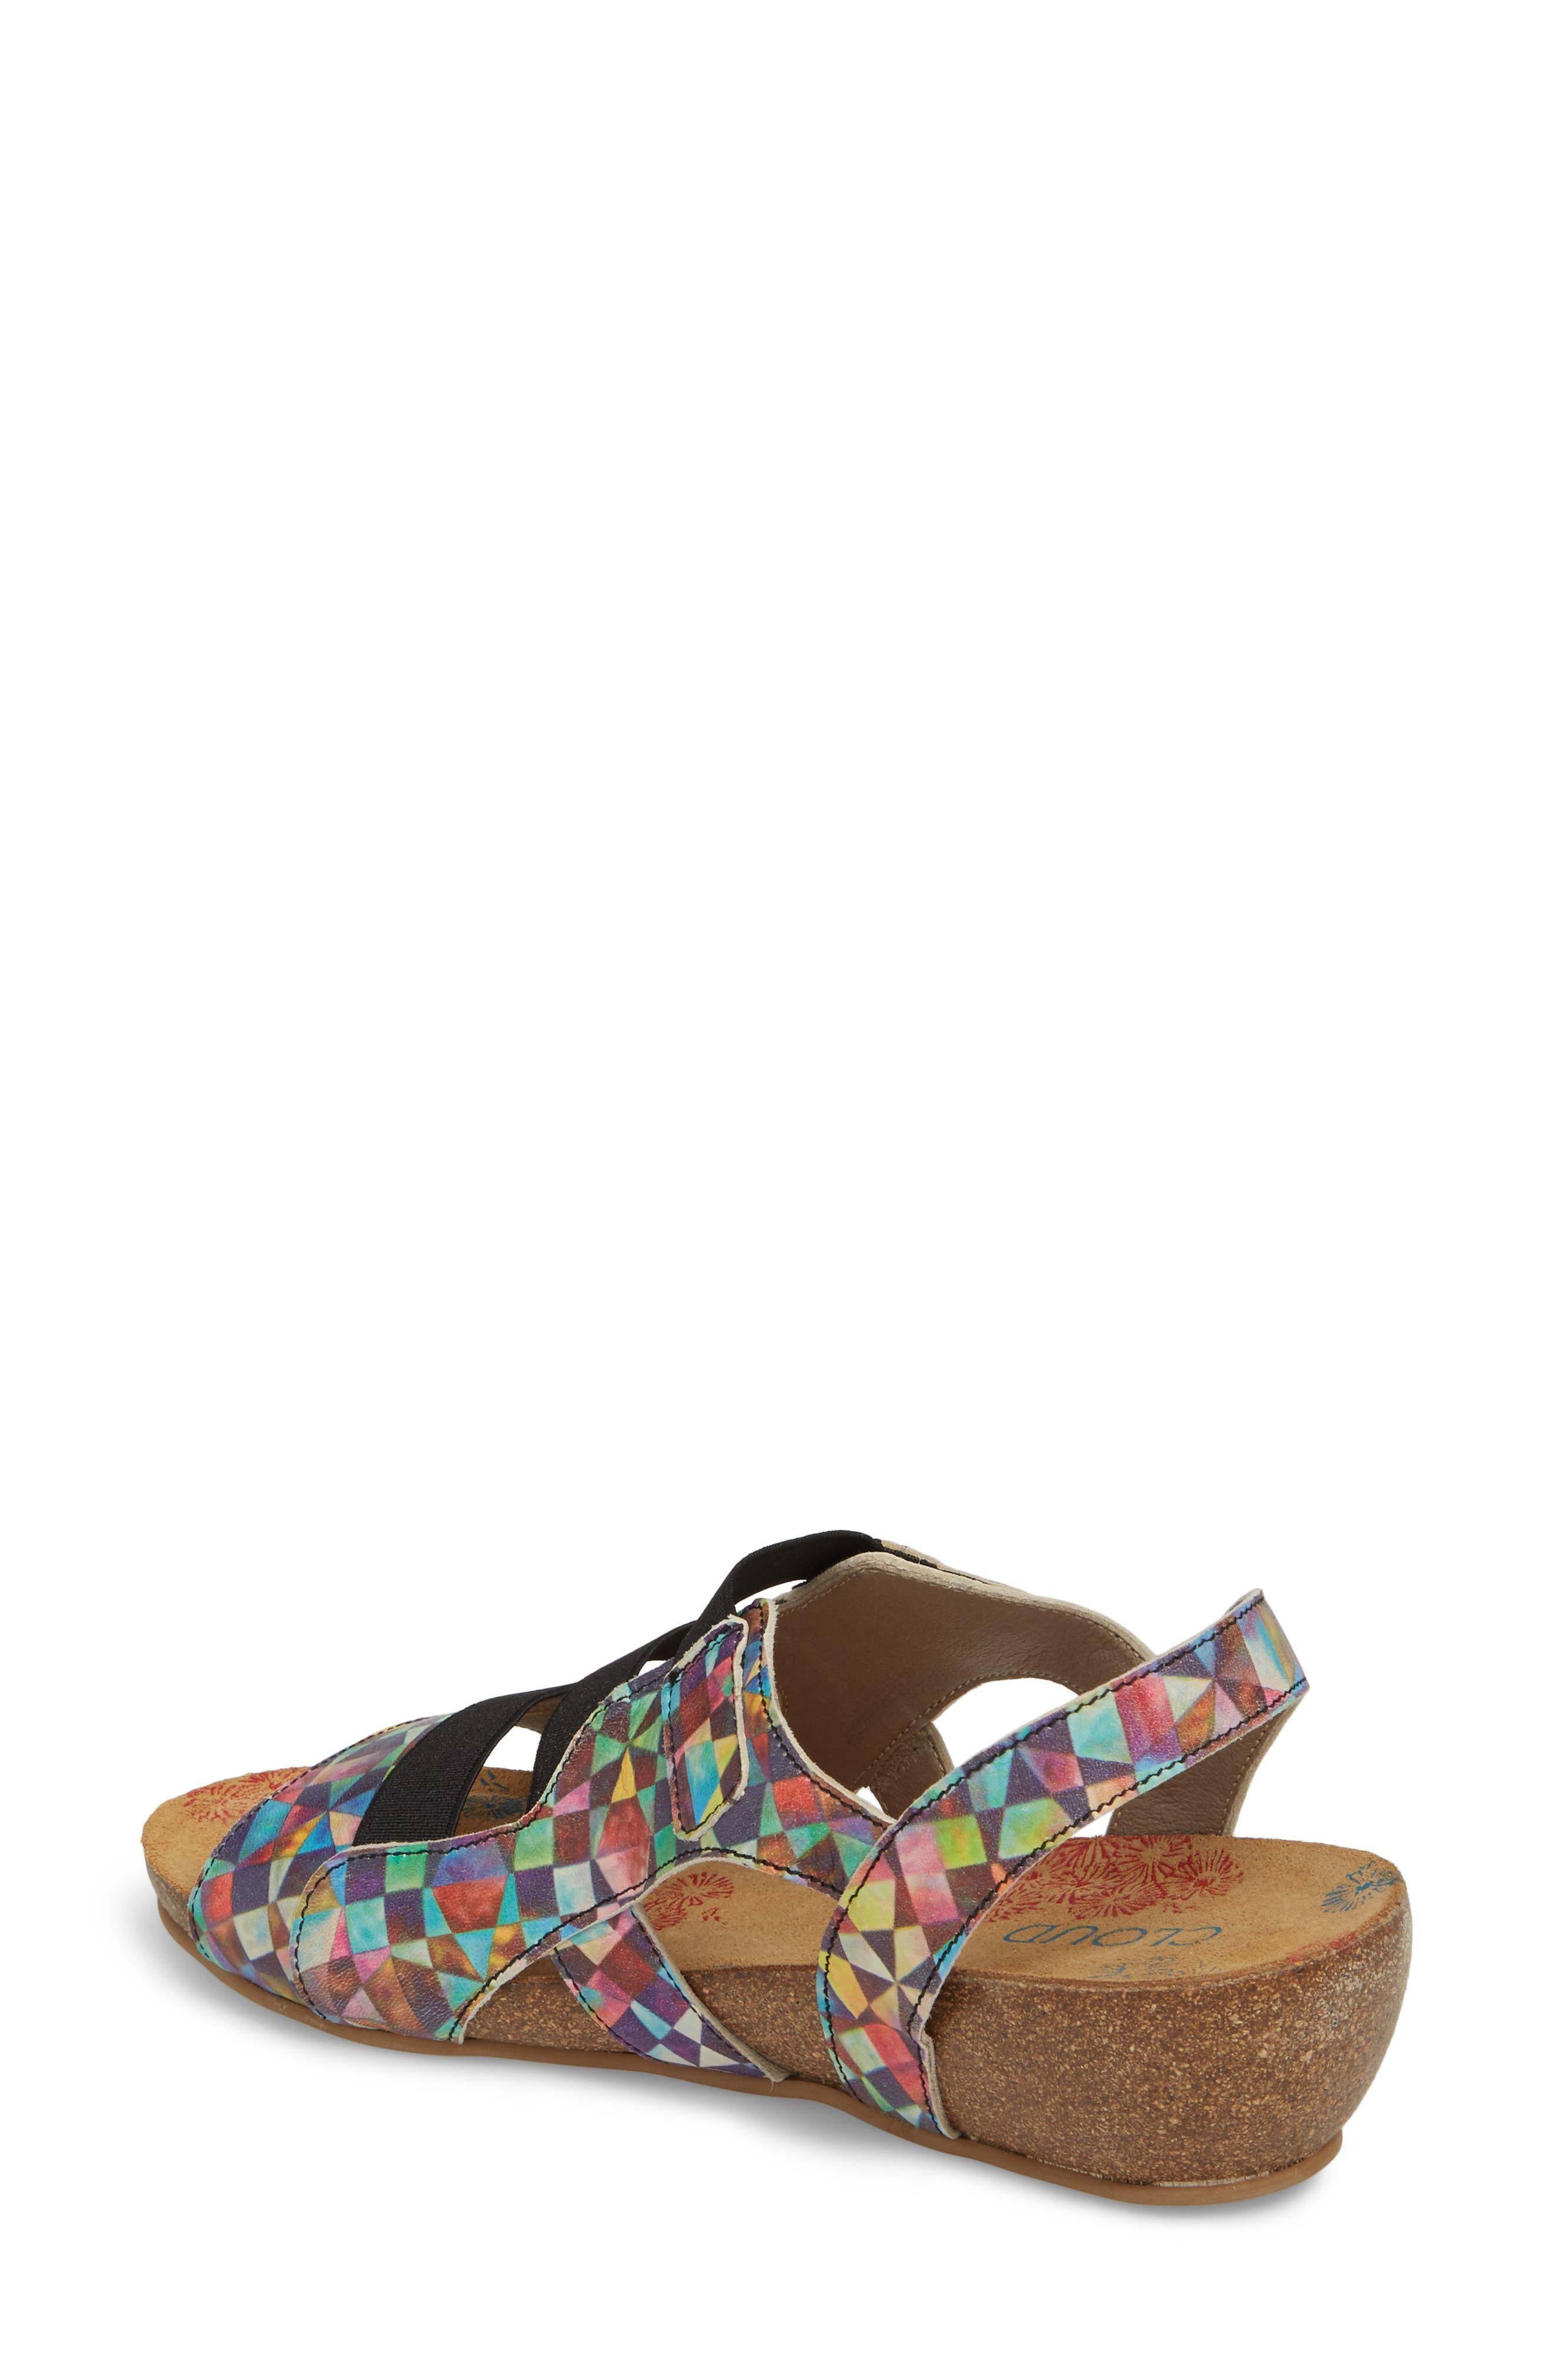 Duffy Wedge Sandal,                             Alternate thumbnail 2, color,                             Mystere Leather